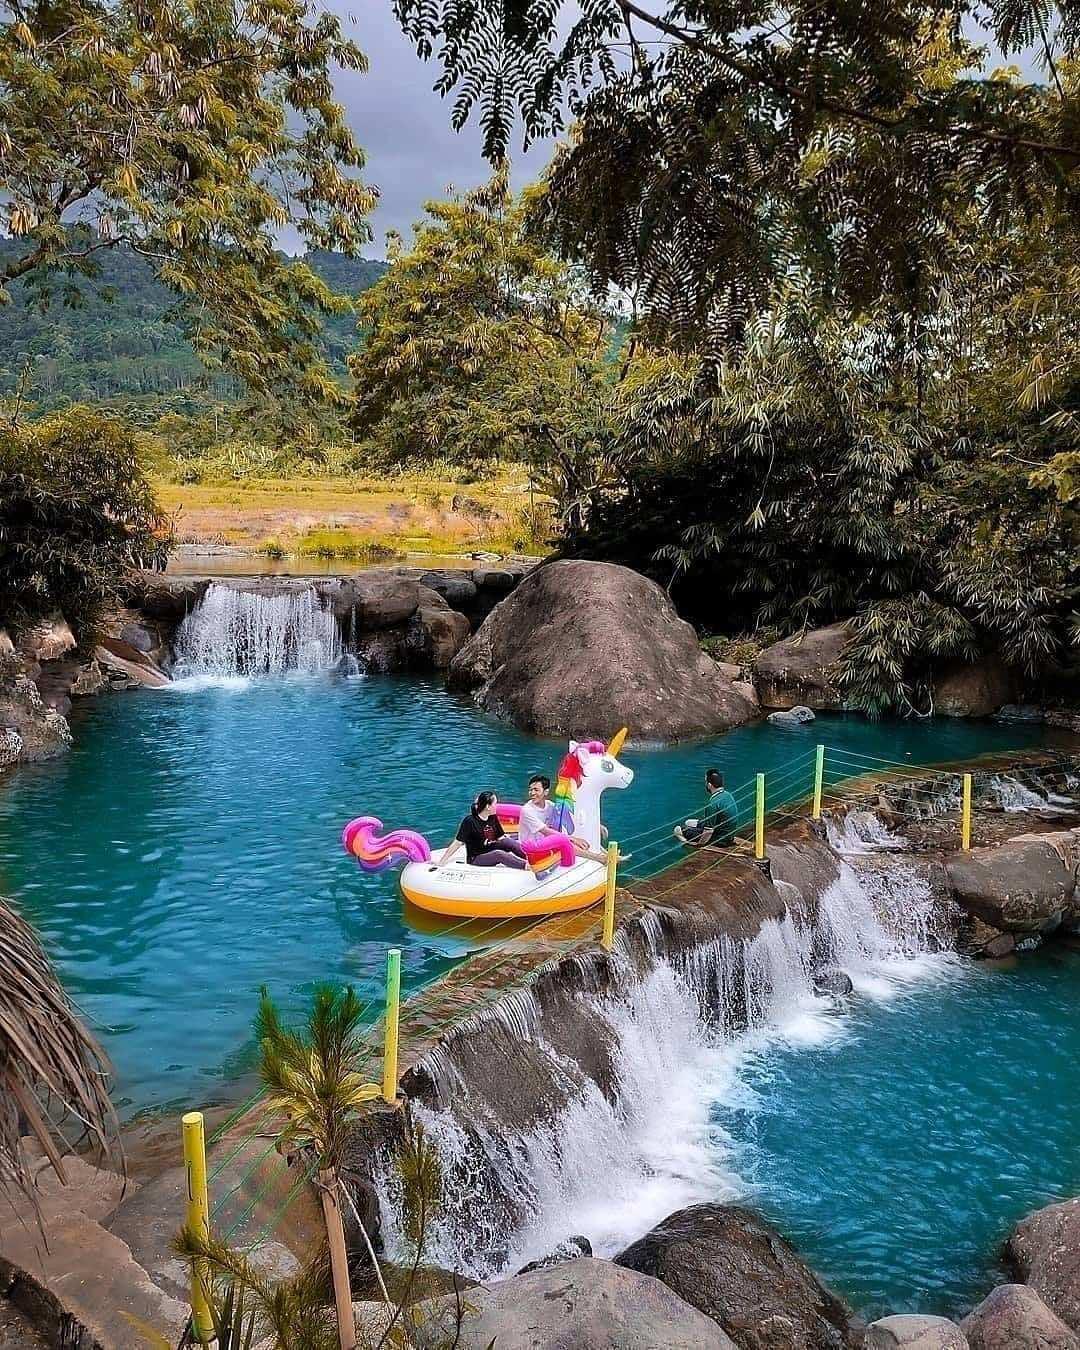 Bermain Air di Leuwi Pangaduan Bojong Koneng Bogor Image From @dityafi